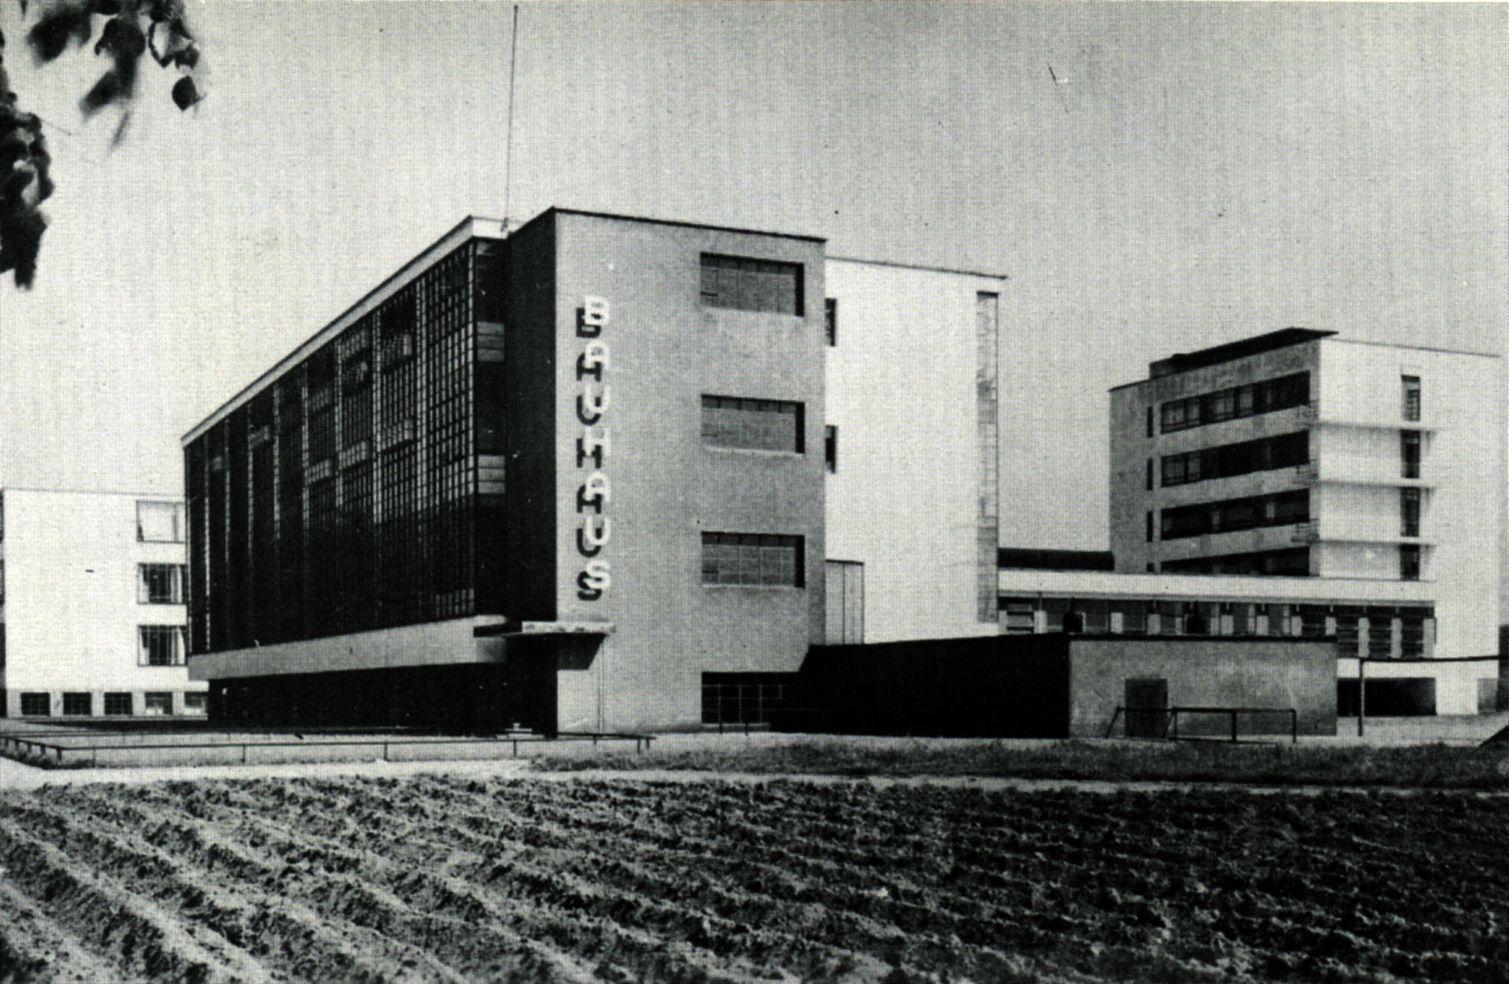 Bauhaus 10 Dot Points Bauhaus Architecture Bauhaus Architecture